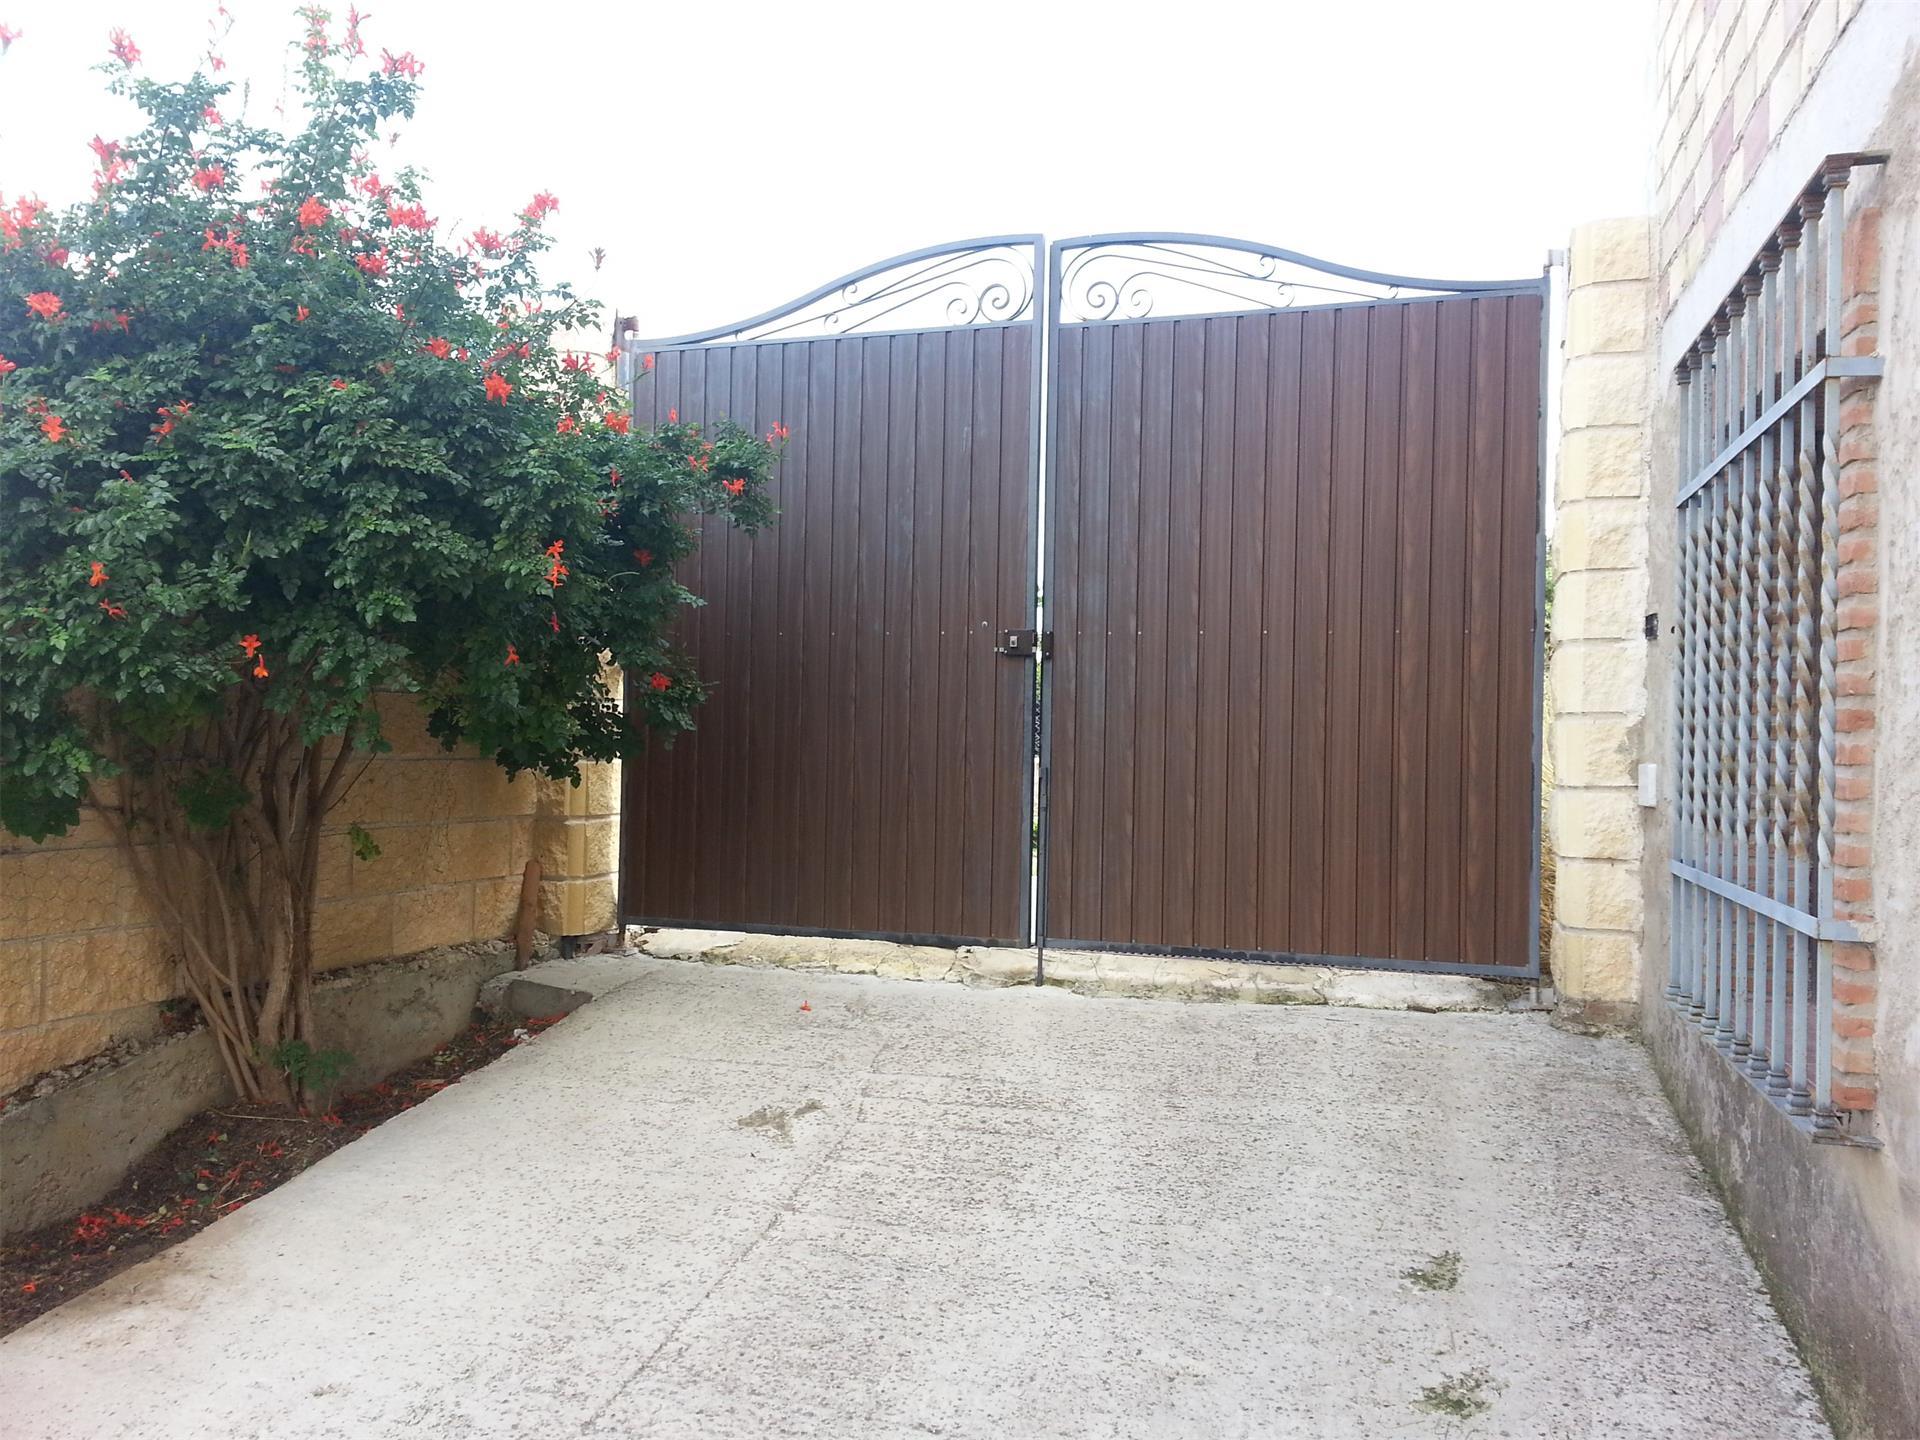 Casa o chalet de alquiler en Calle Higuerilla Uno, 96 Cuevas de San Marcos (Antequera, Málaga)